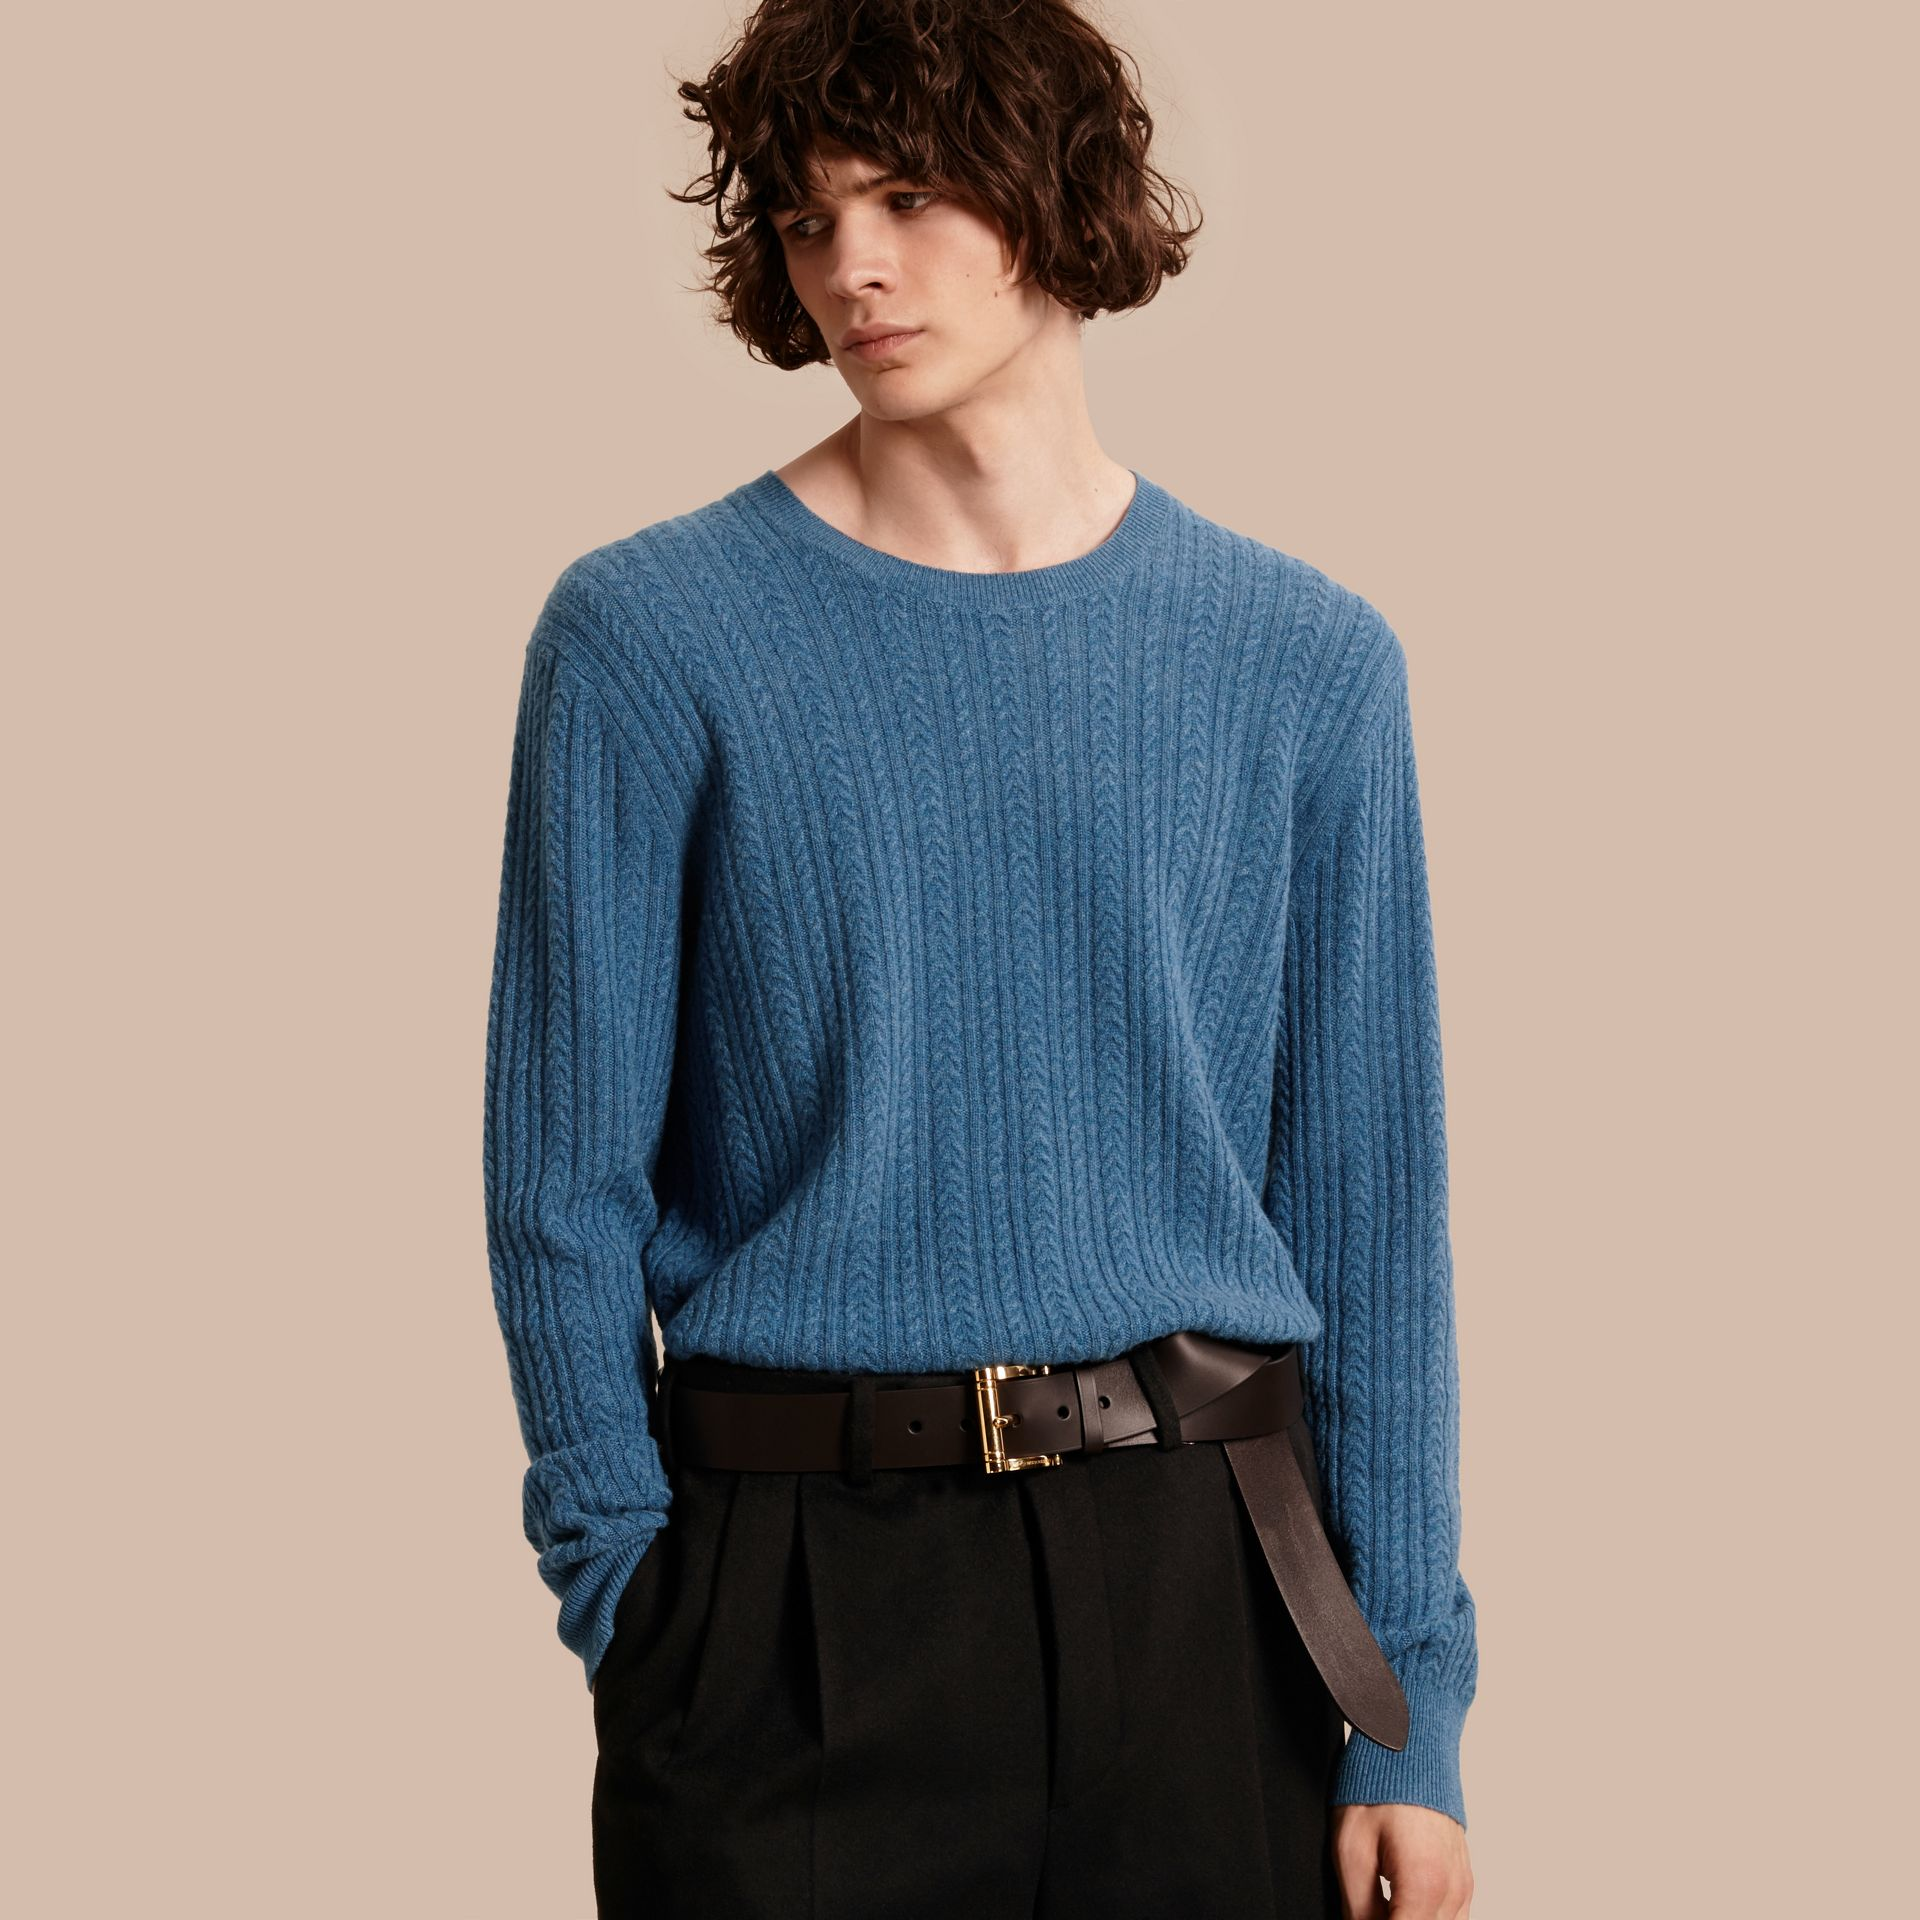 Hydrangea blue Aran Knit Cashmere Sweater Hydrangea Blue - gallery image 1